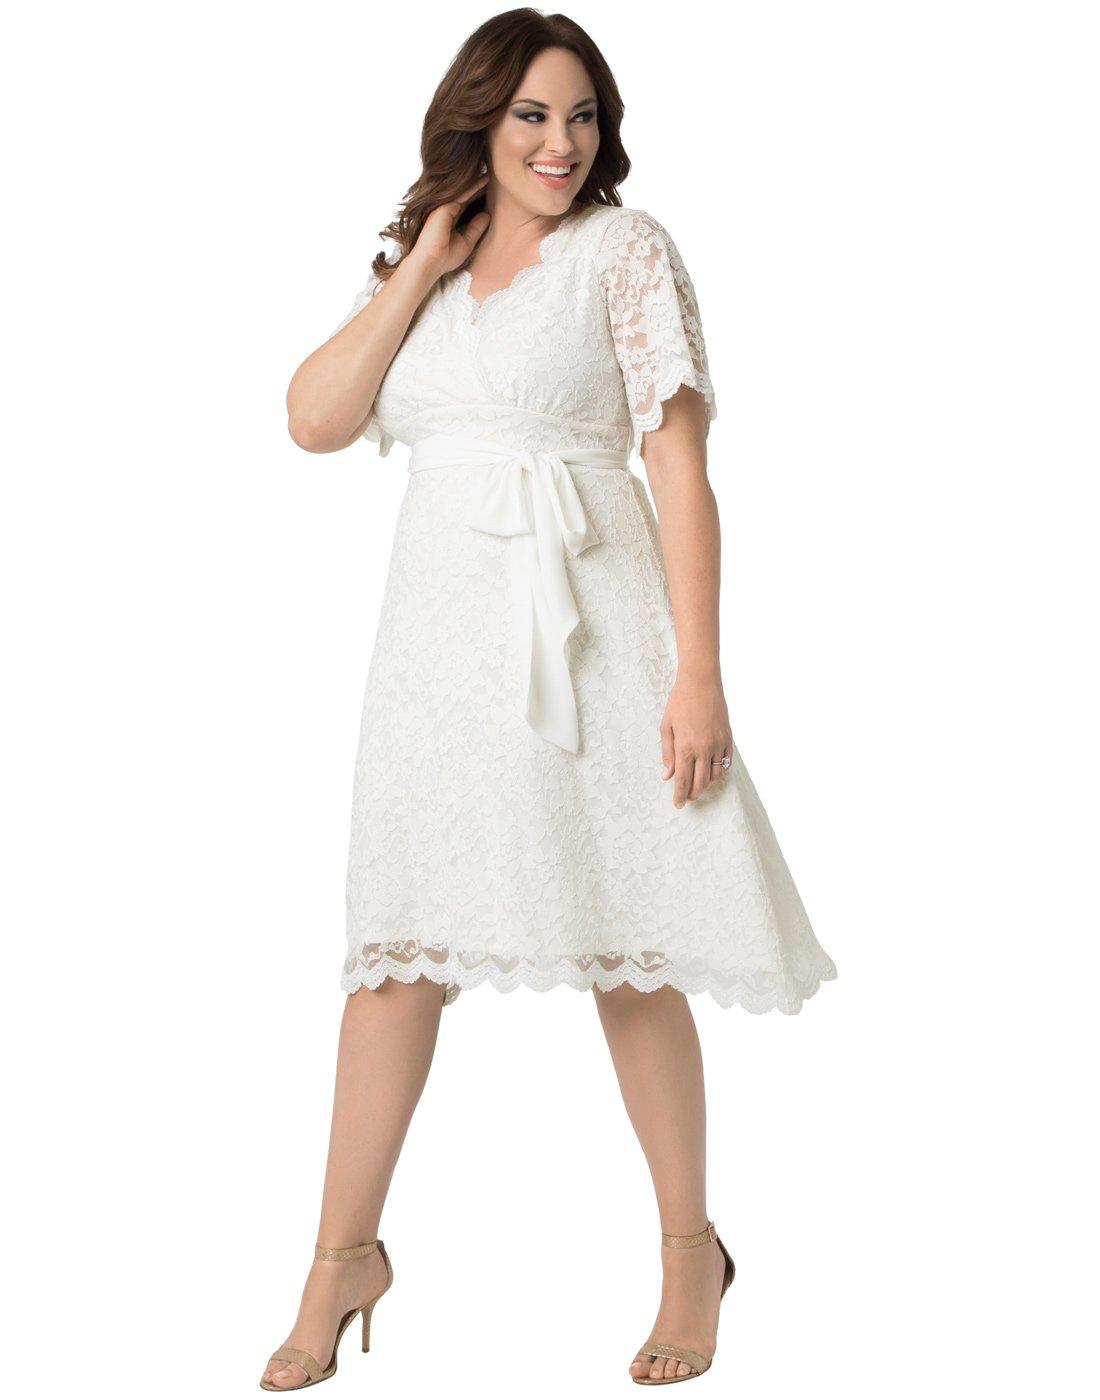 Kiyonna Women's Plus Size Graced With Love Wedding Dress 4X Ivory